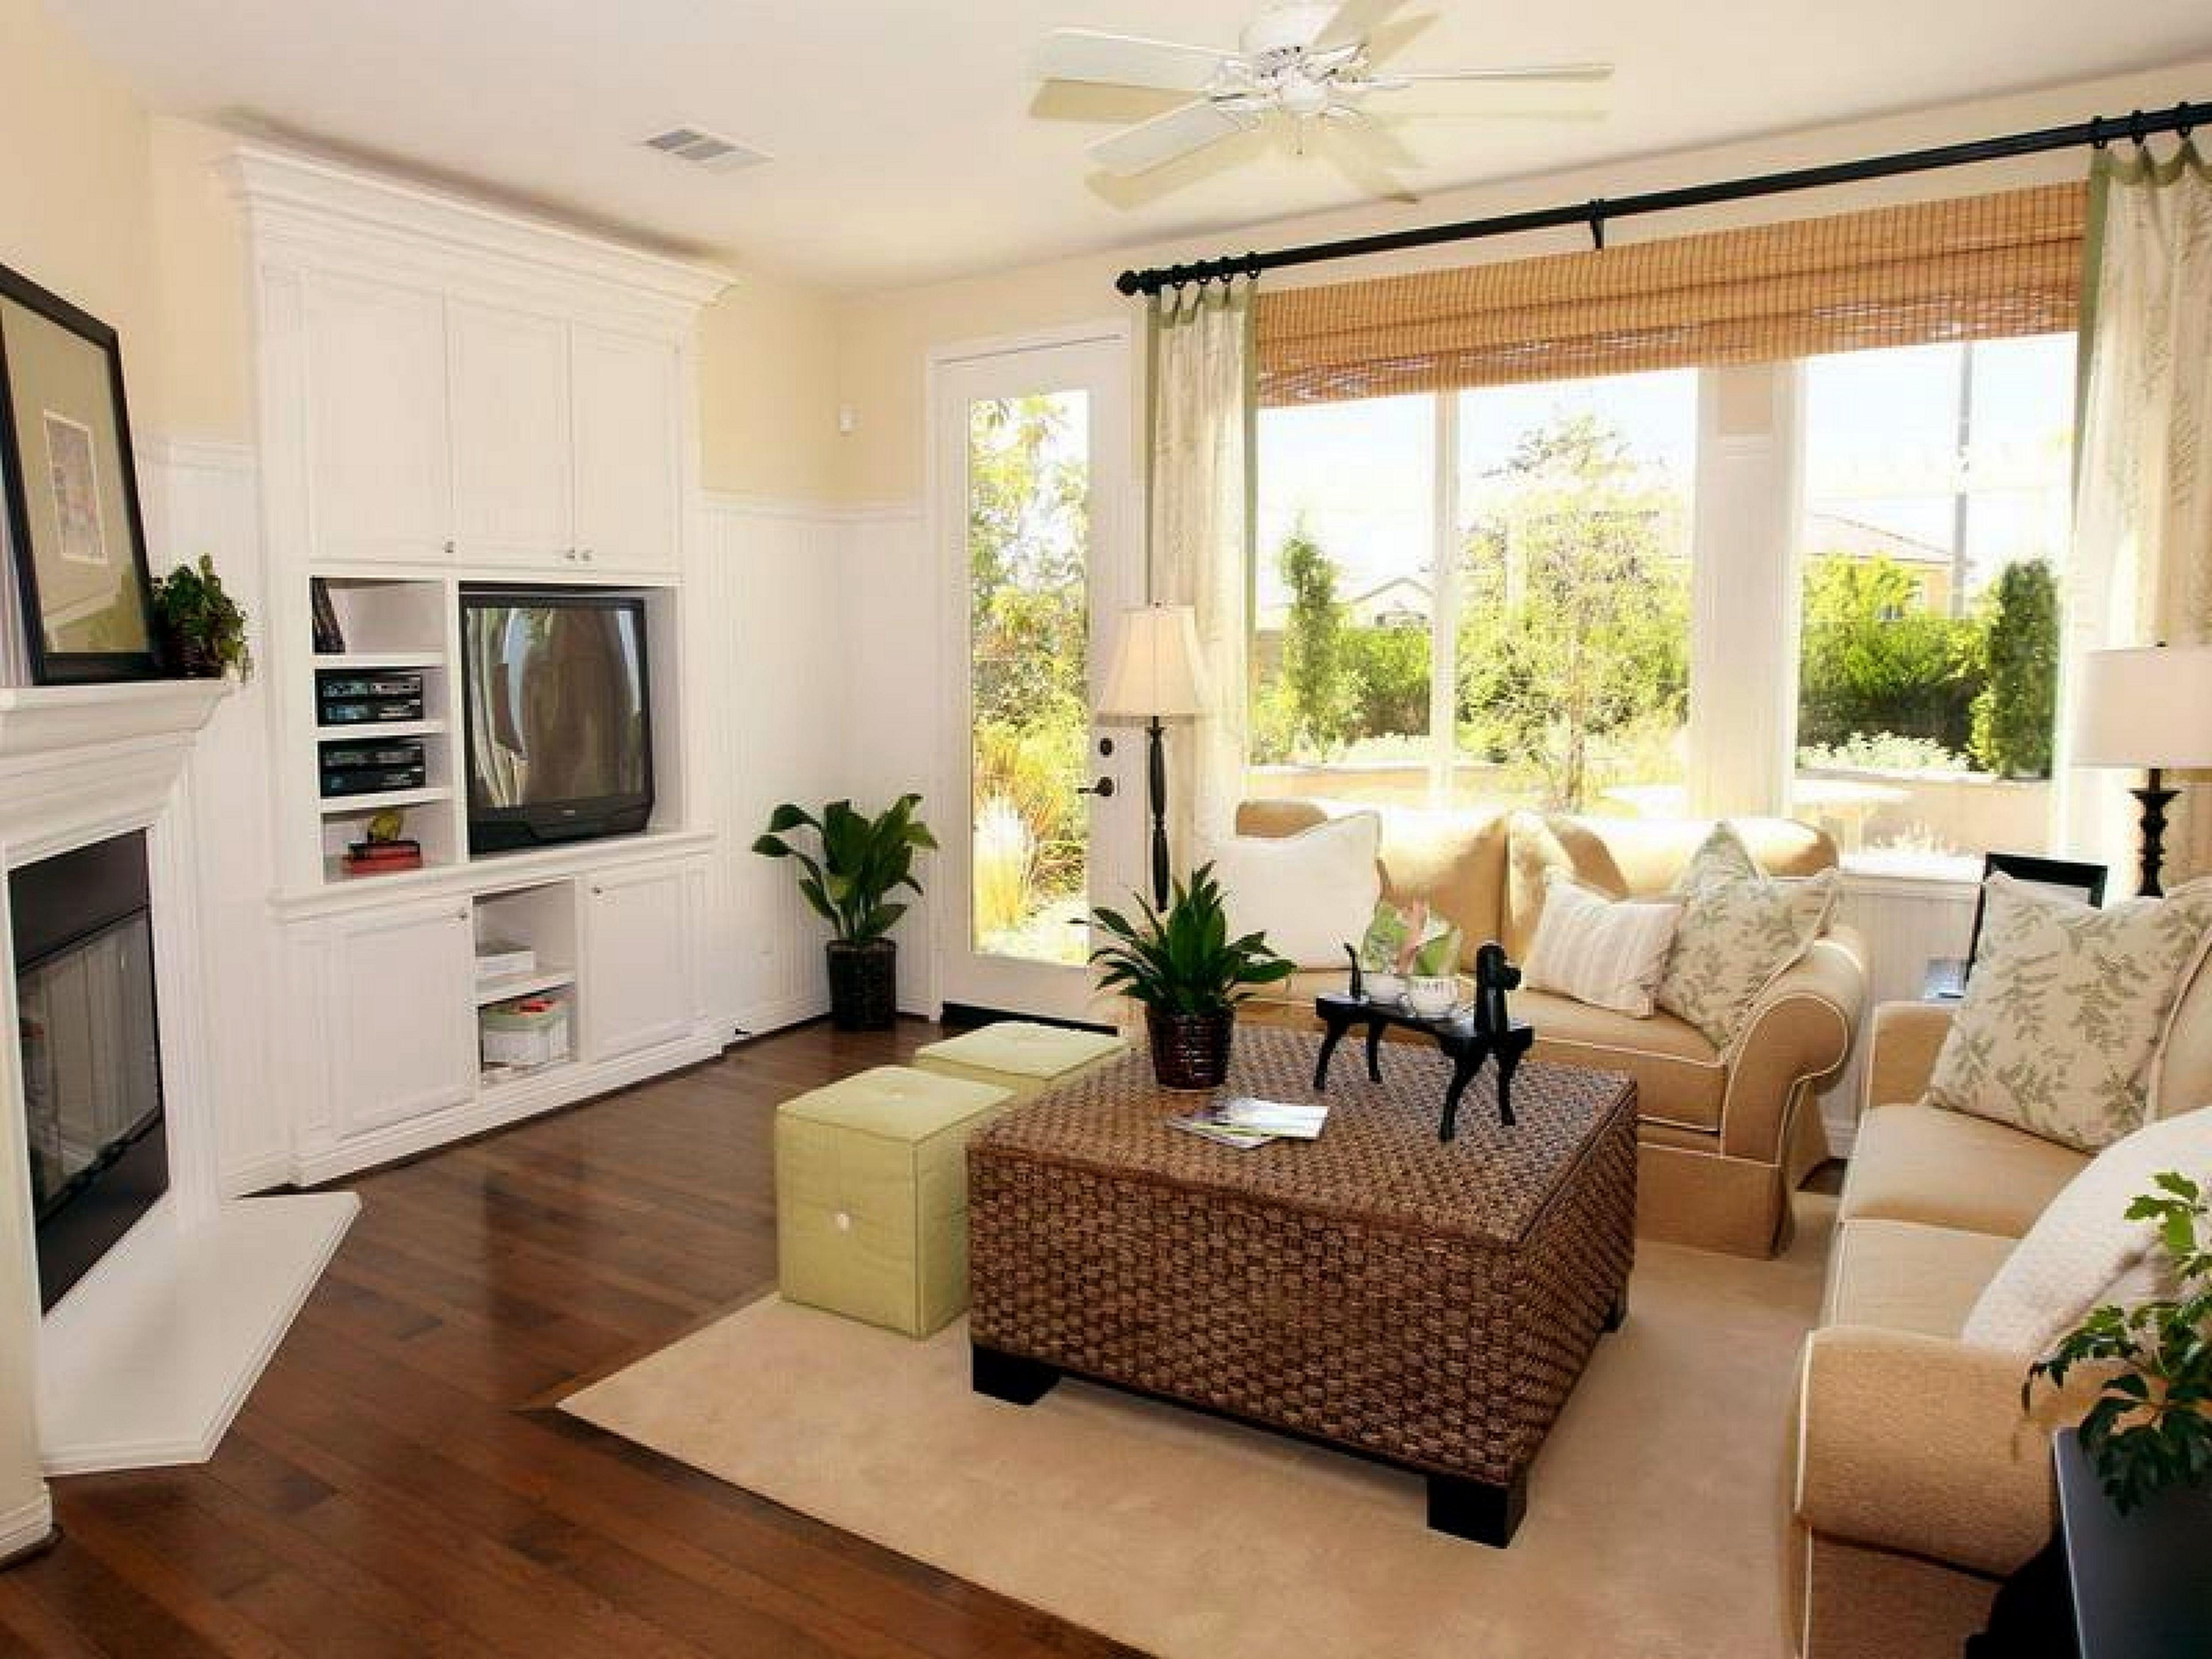 35 Best Apartment Interior Design Ideas To Make Your Room Beautiful Freshouz Com Small Apartment Living Room Apartment Living Room Rectangular Living Rooms